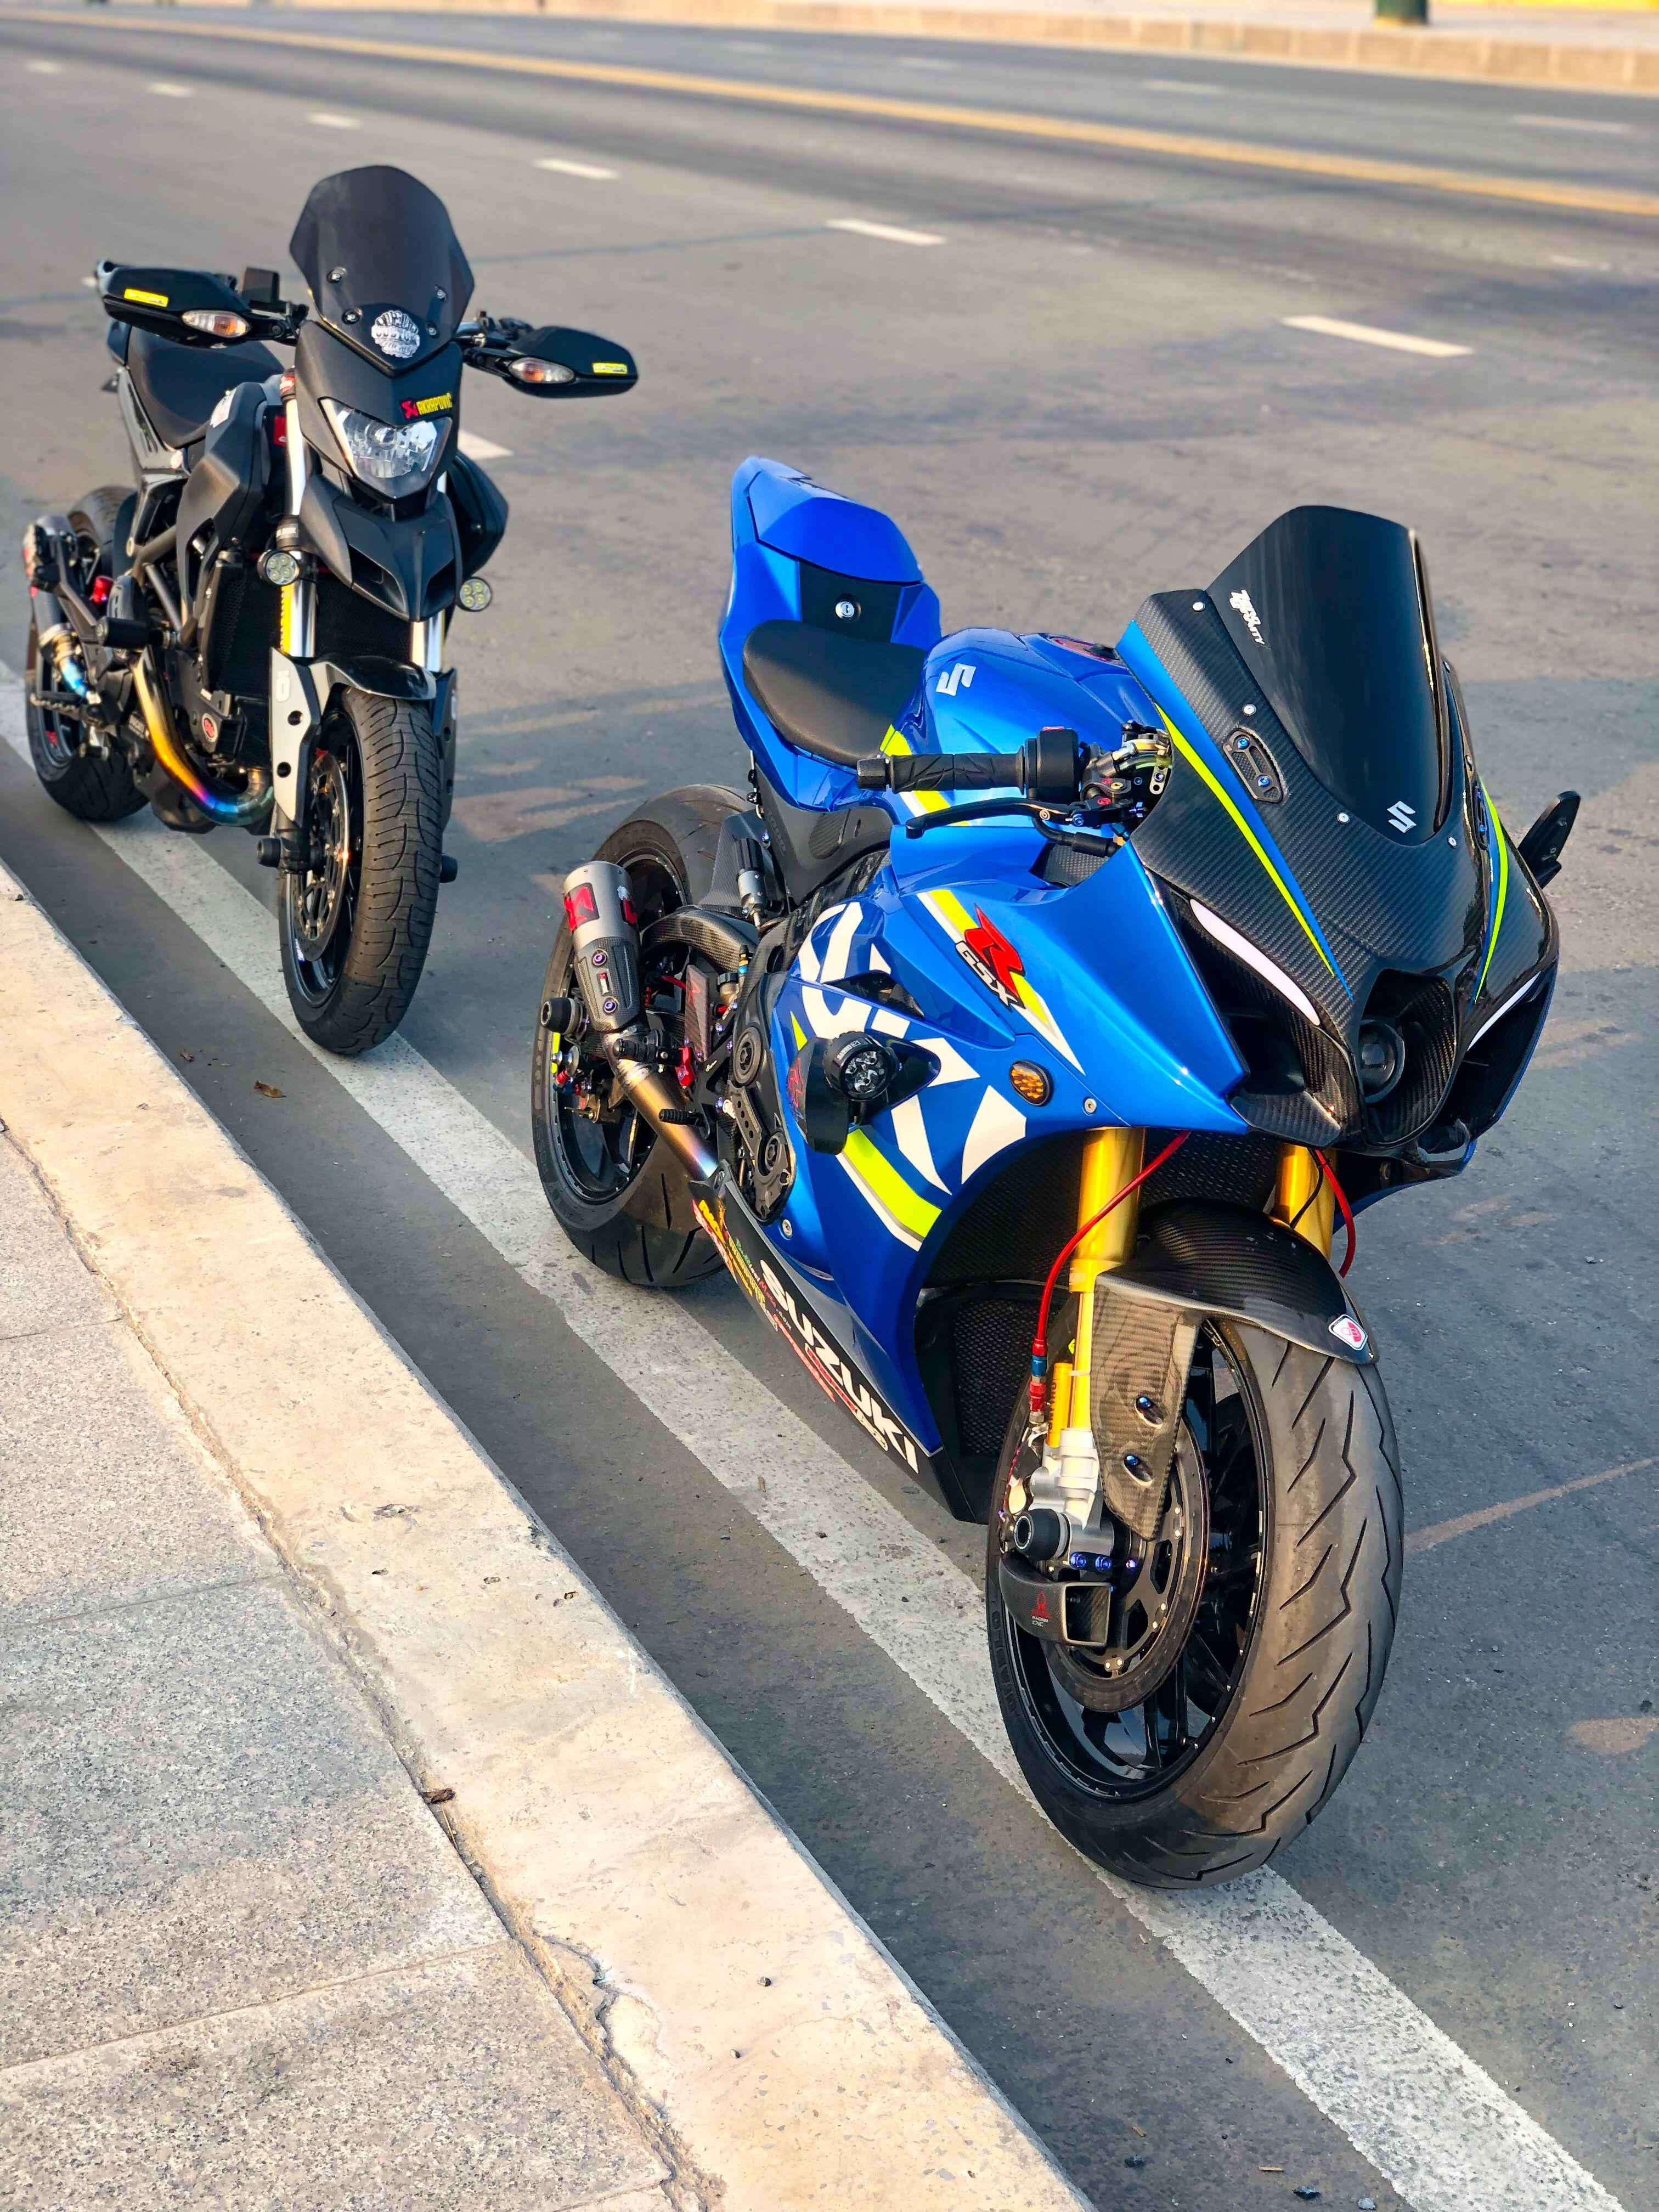 My gixxer suzuki gsxr1000 | my motor idea | Mô tô và Xe đẹp